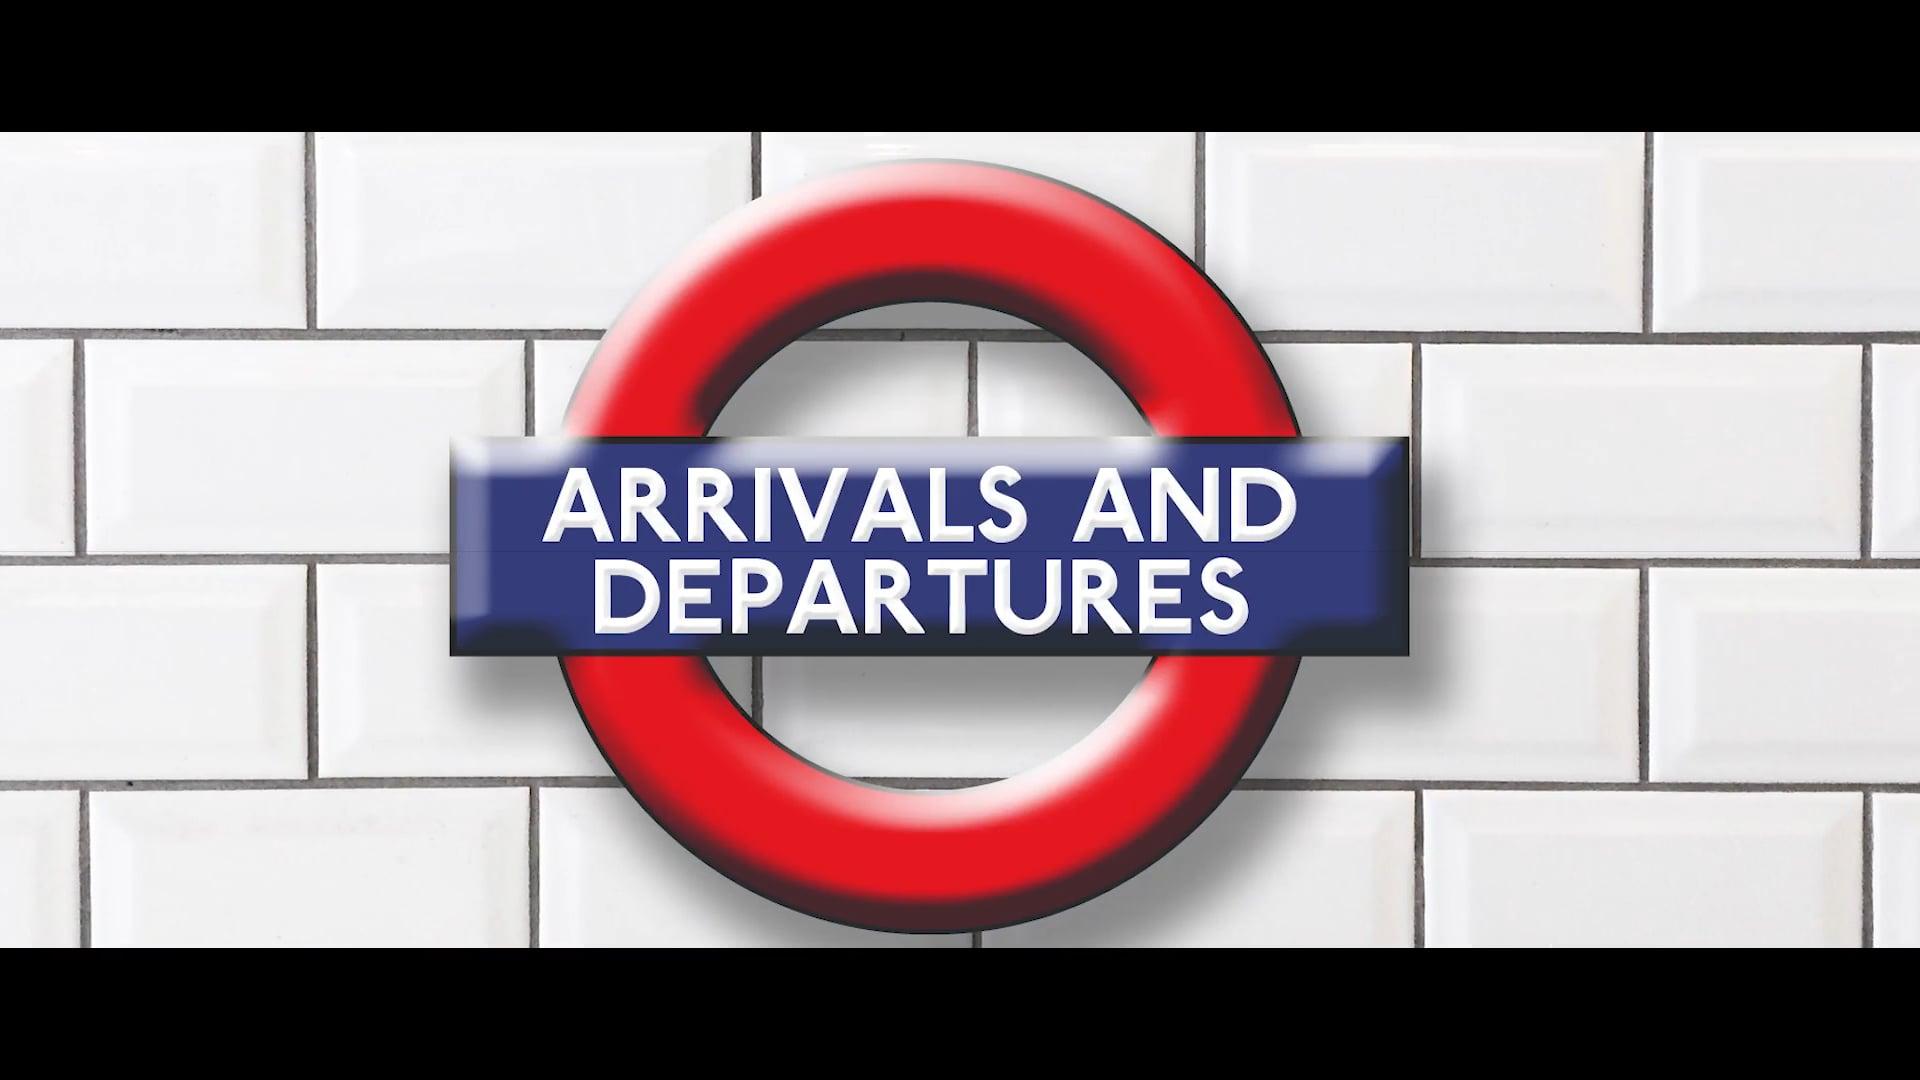 ARRIVALS & DEPARTURES - TRAILER FILM